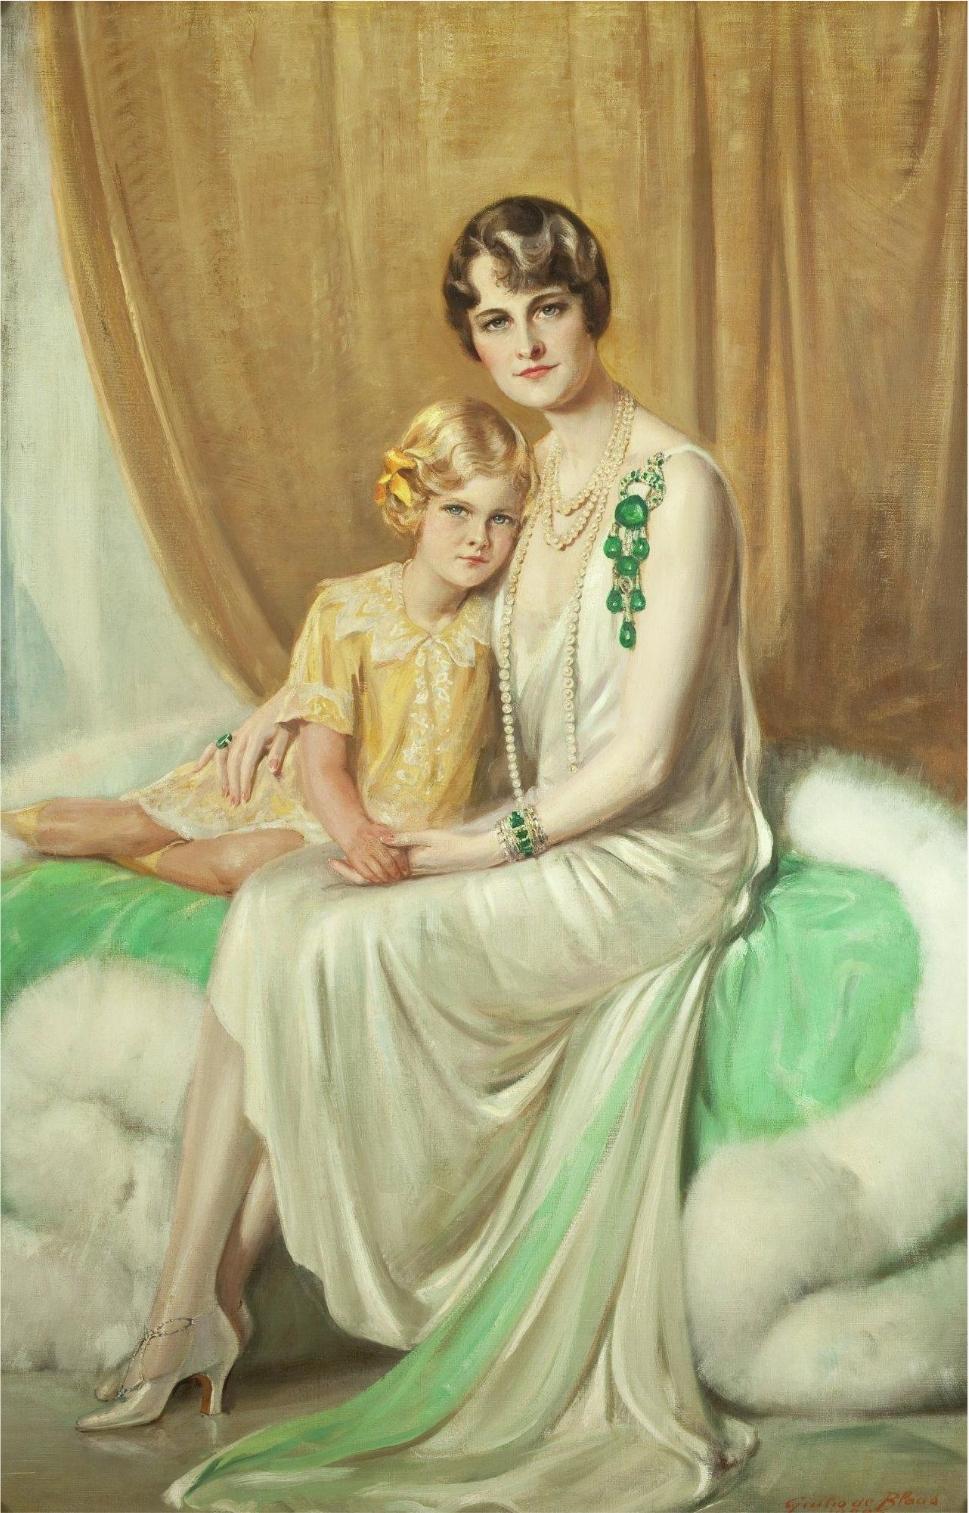 Giulio de Blaas.  Portrait of Mrs. Huttonand Nedenia Hutton  (Marjorie Merriweather Post withher daughter), 1929